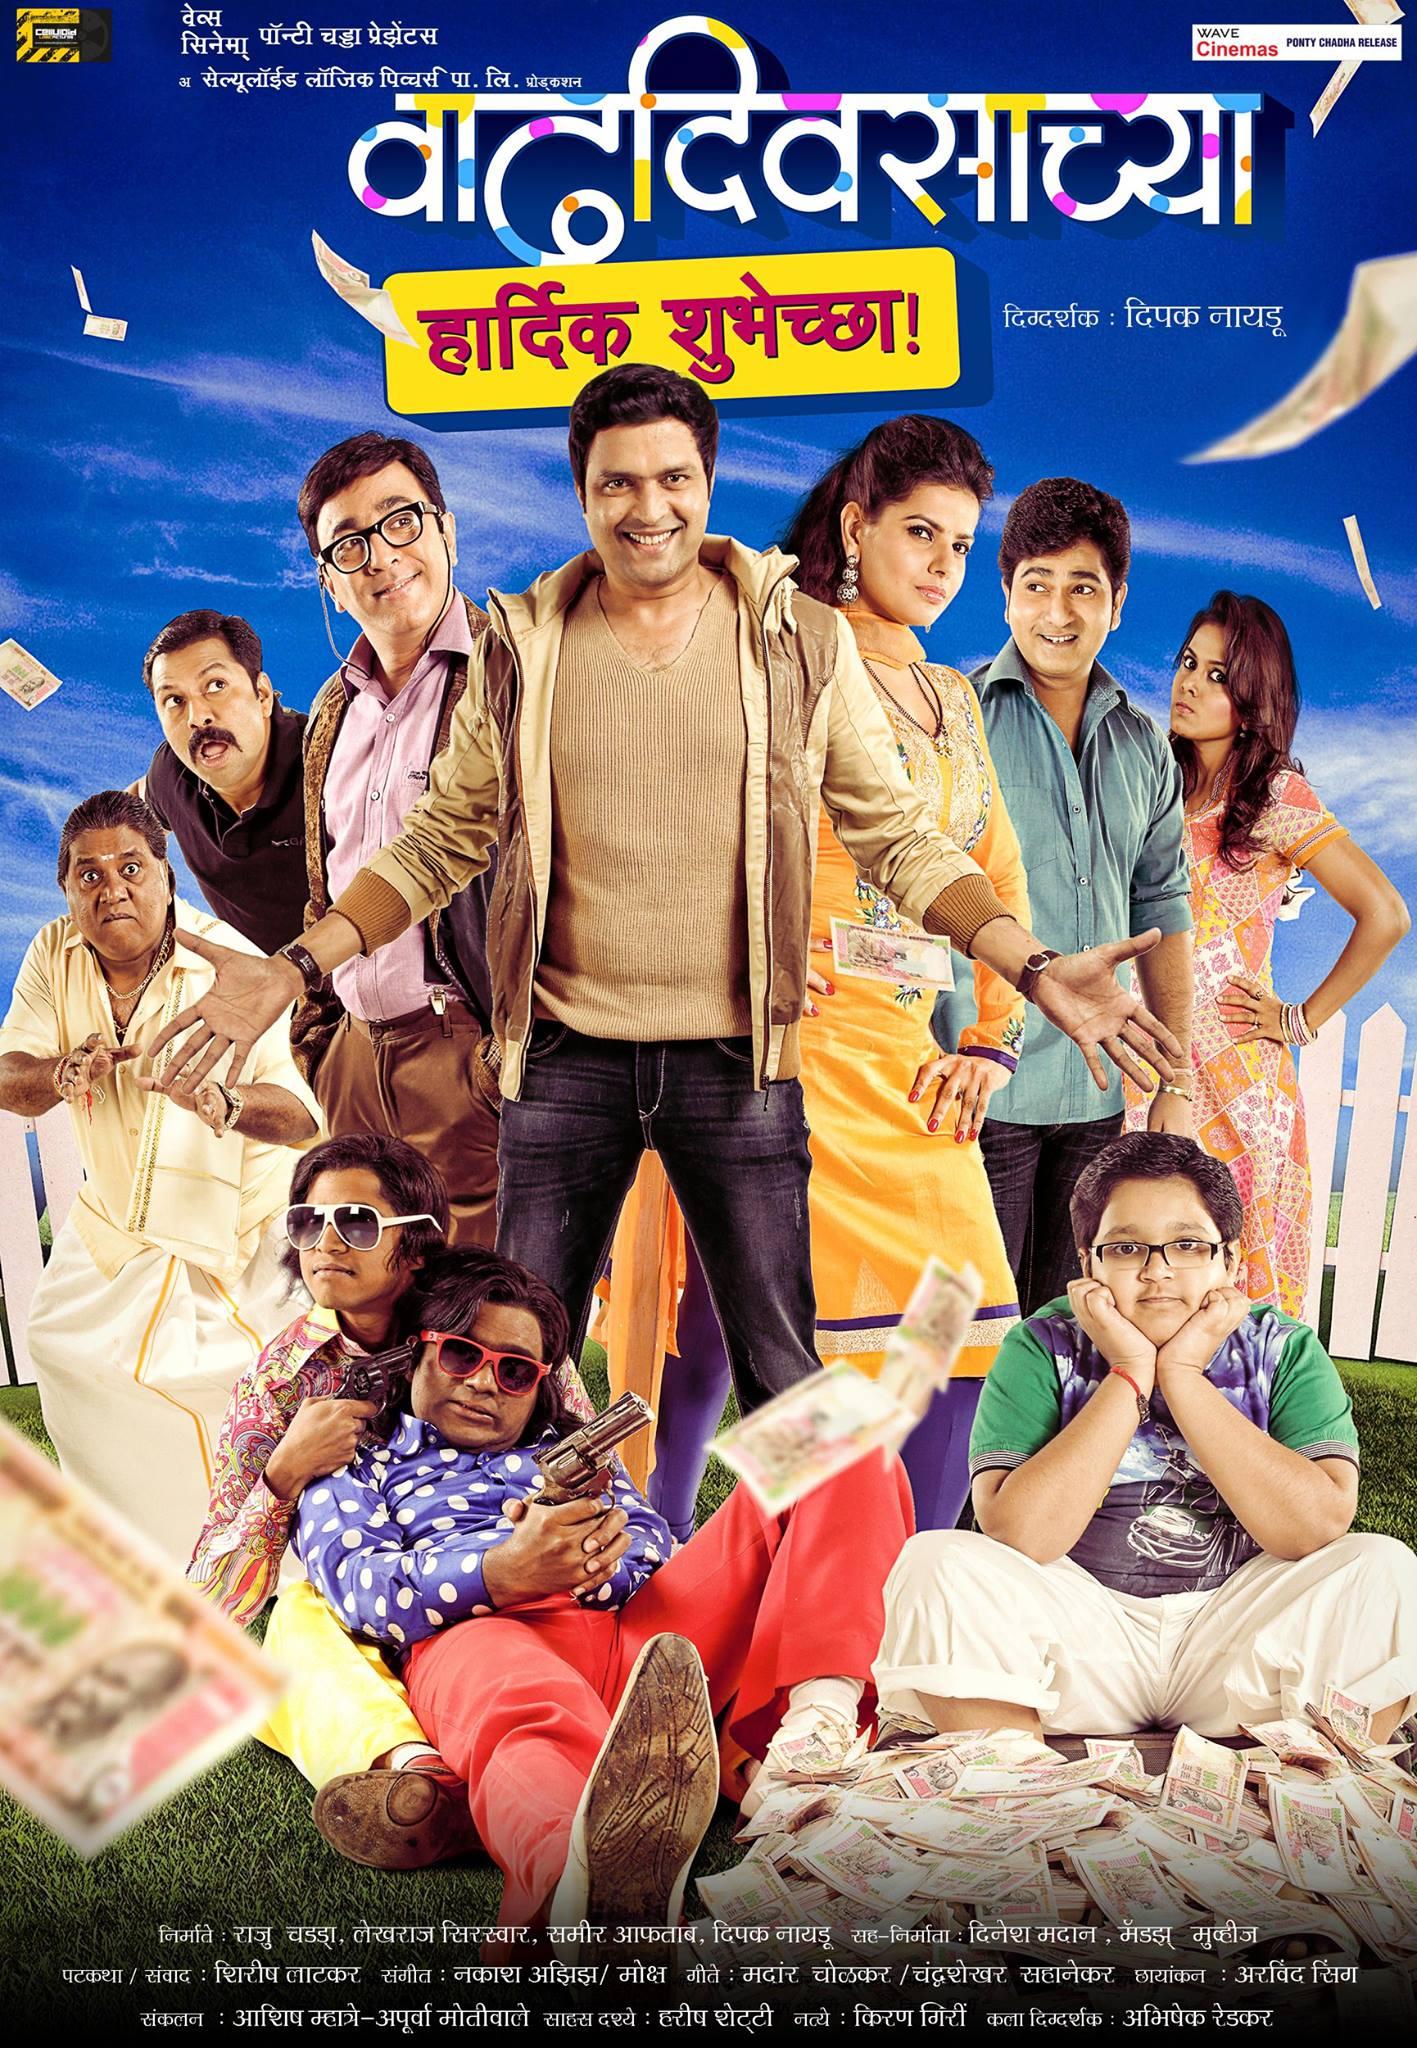 Vadhdivsachya Hardik Shubhechha Marathi Movie Vadhdivas Chya Hardik Shubhechha